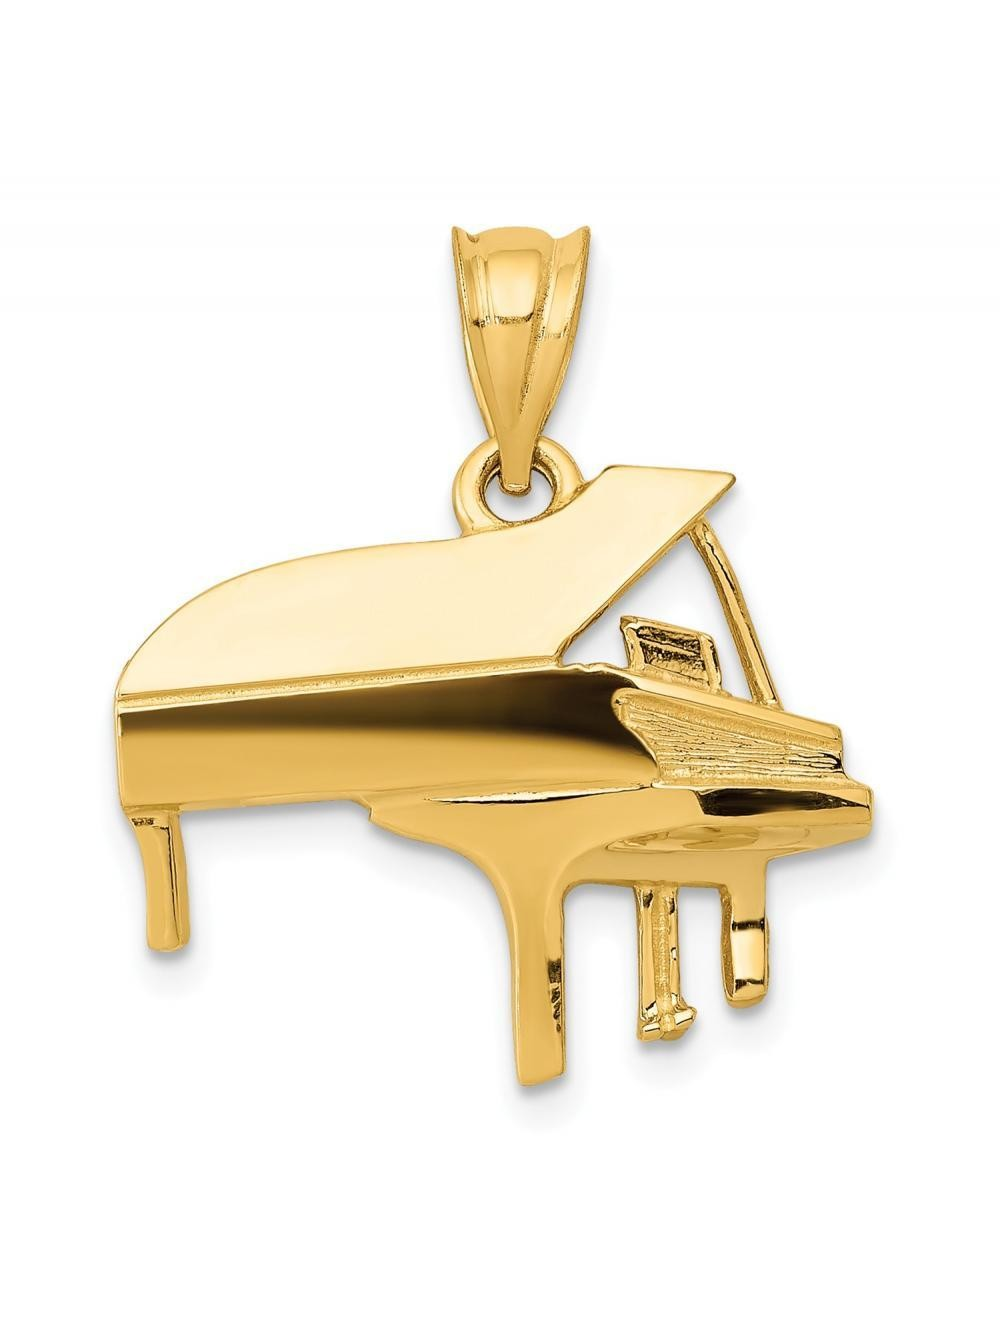 14k Yellow Gold Piano Charm Pendant - 20mm